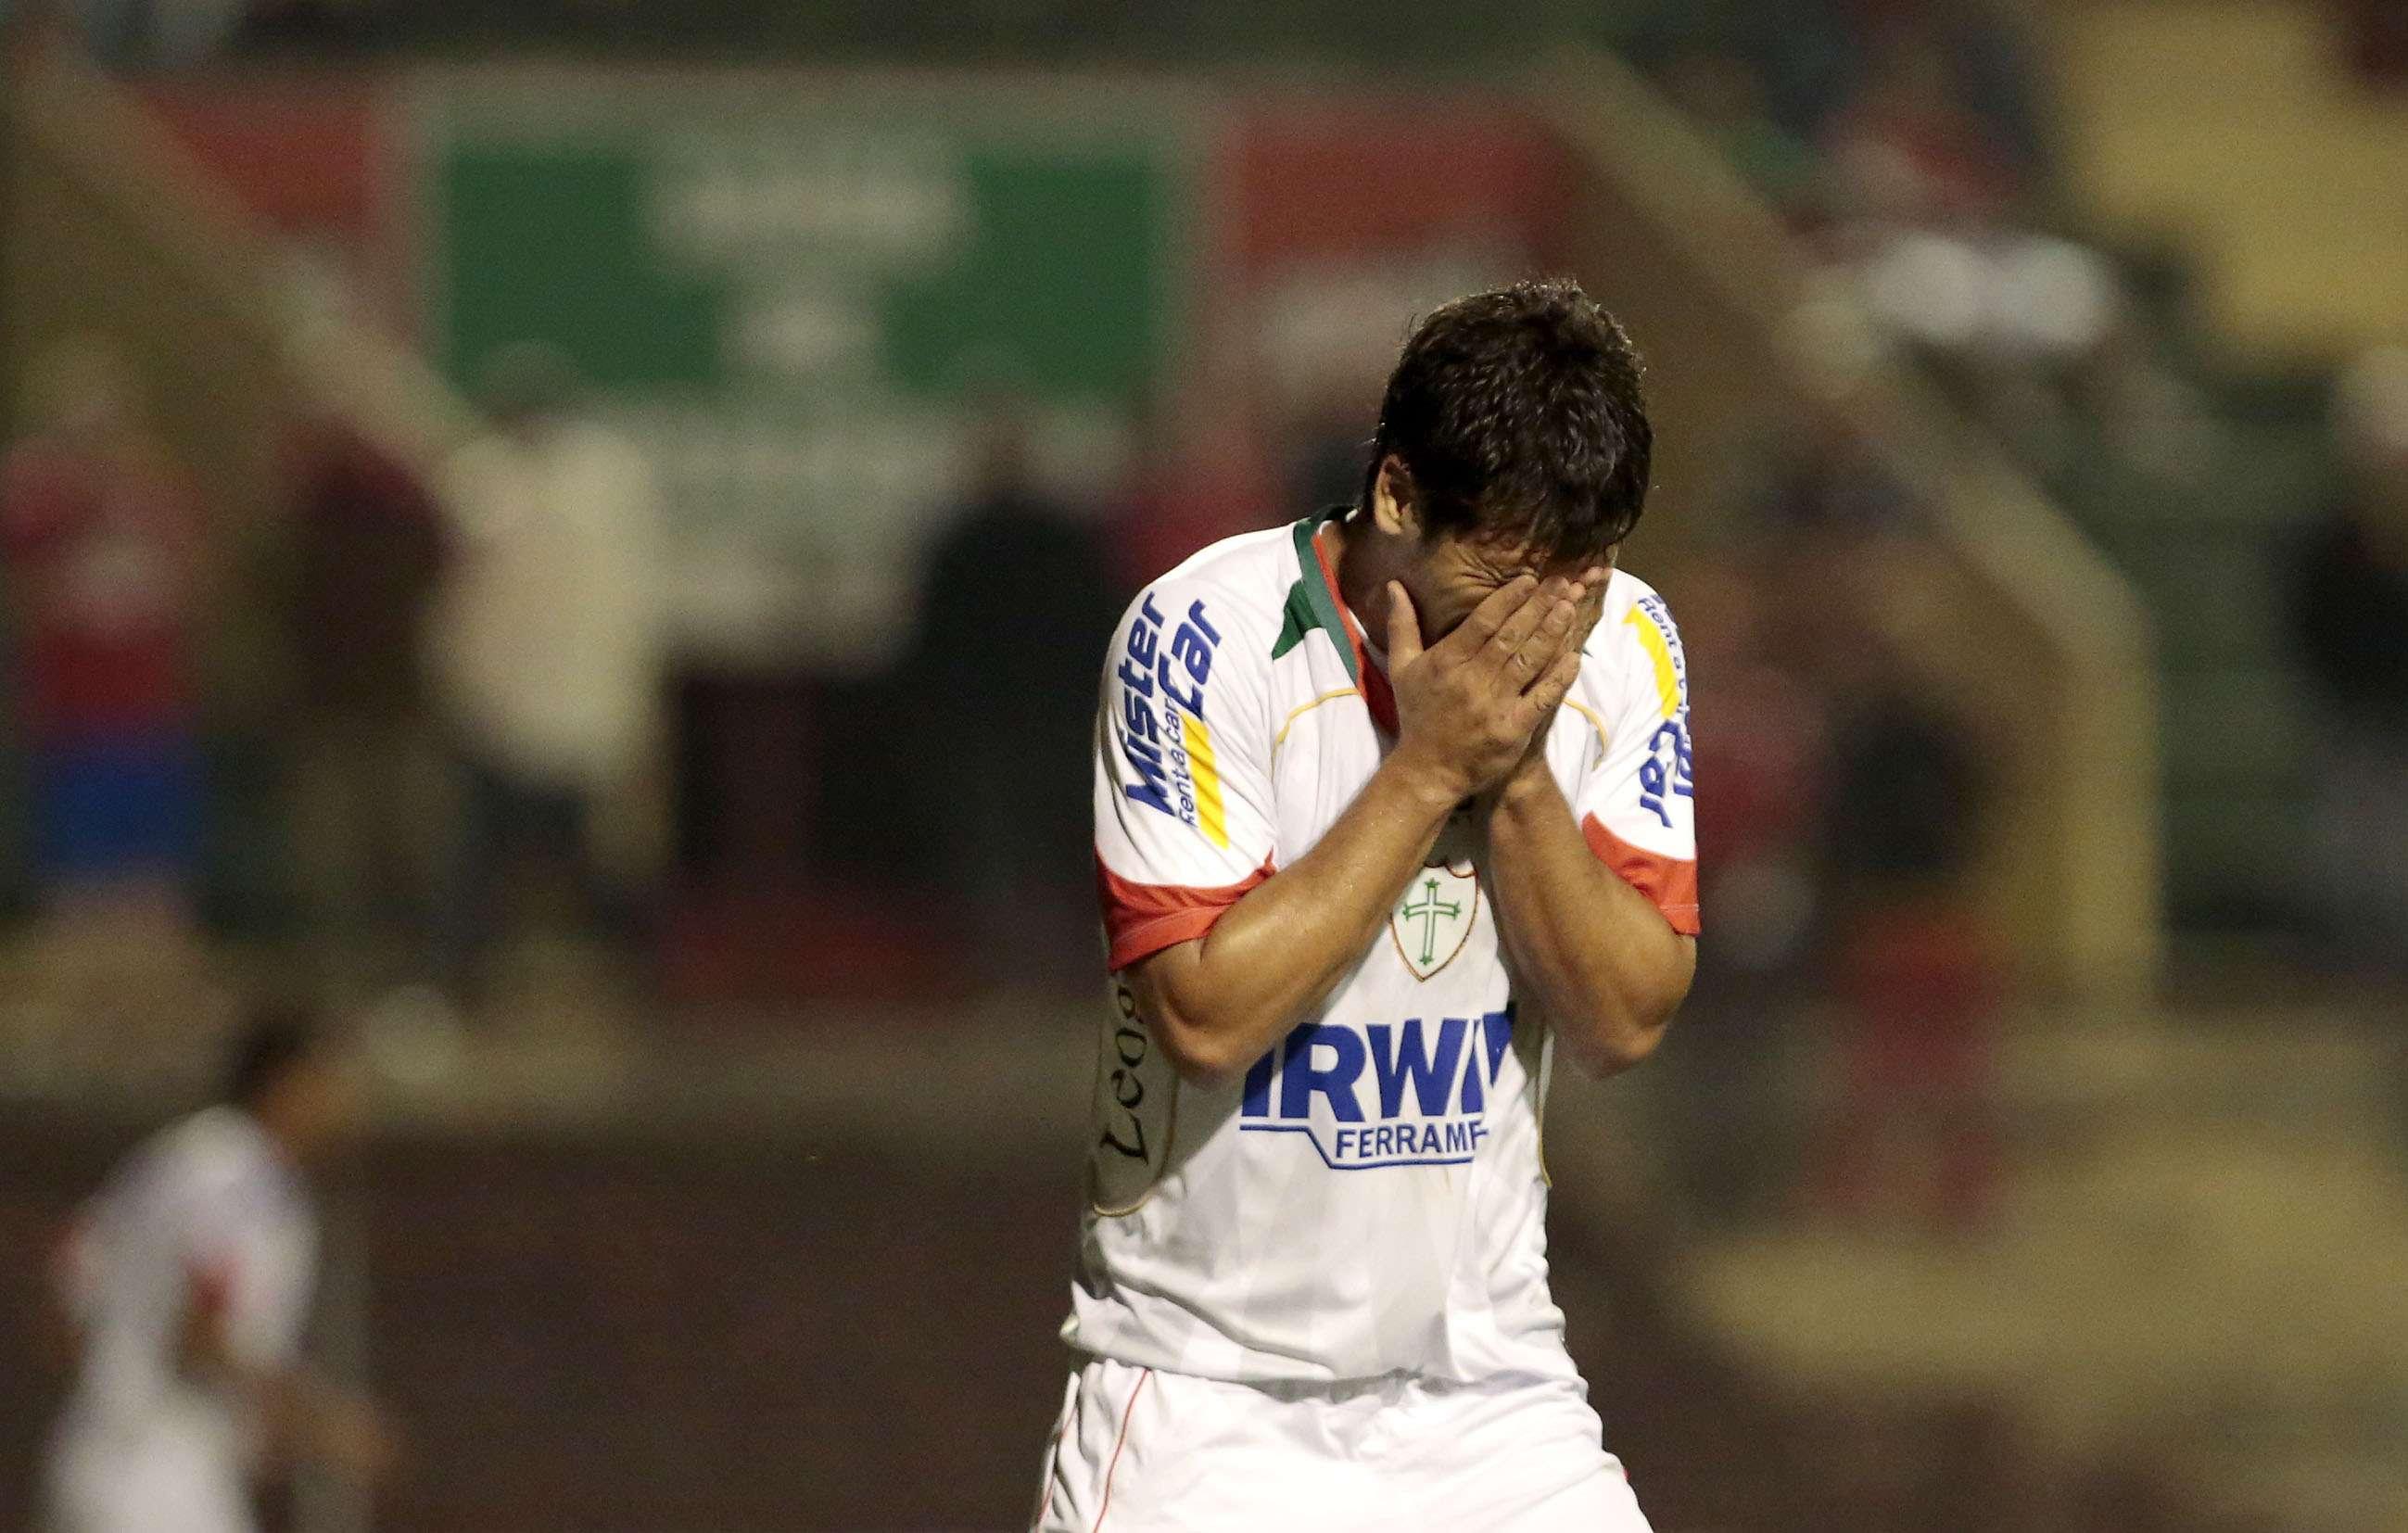 Héverton se desespera com chance desperdiçada pela Portuguesa Foto: Miguel Schincariol/Gazeta Press